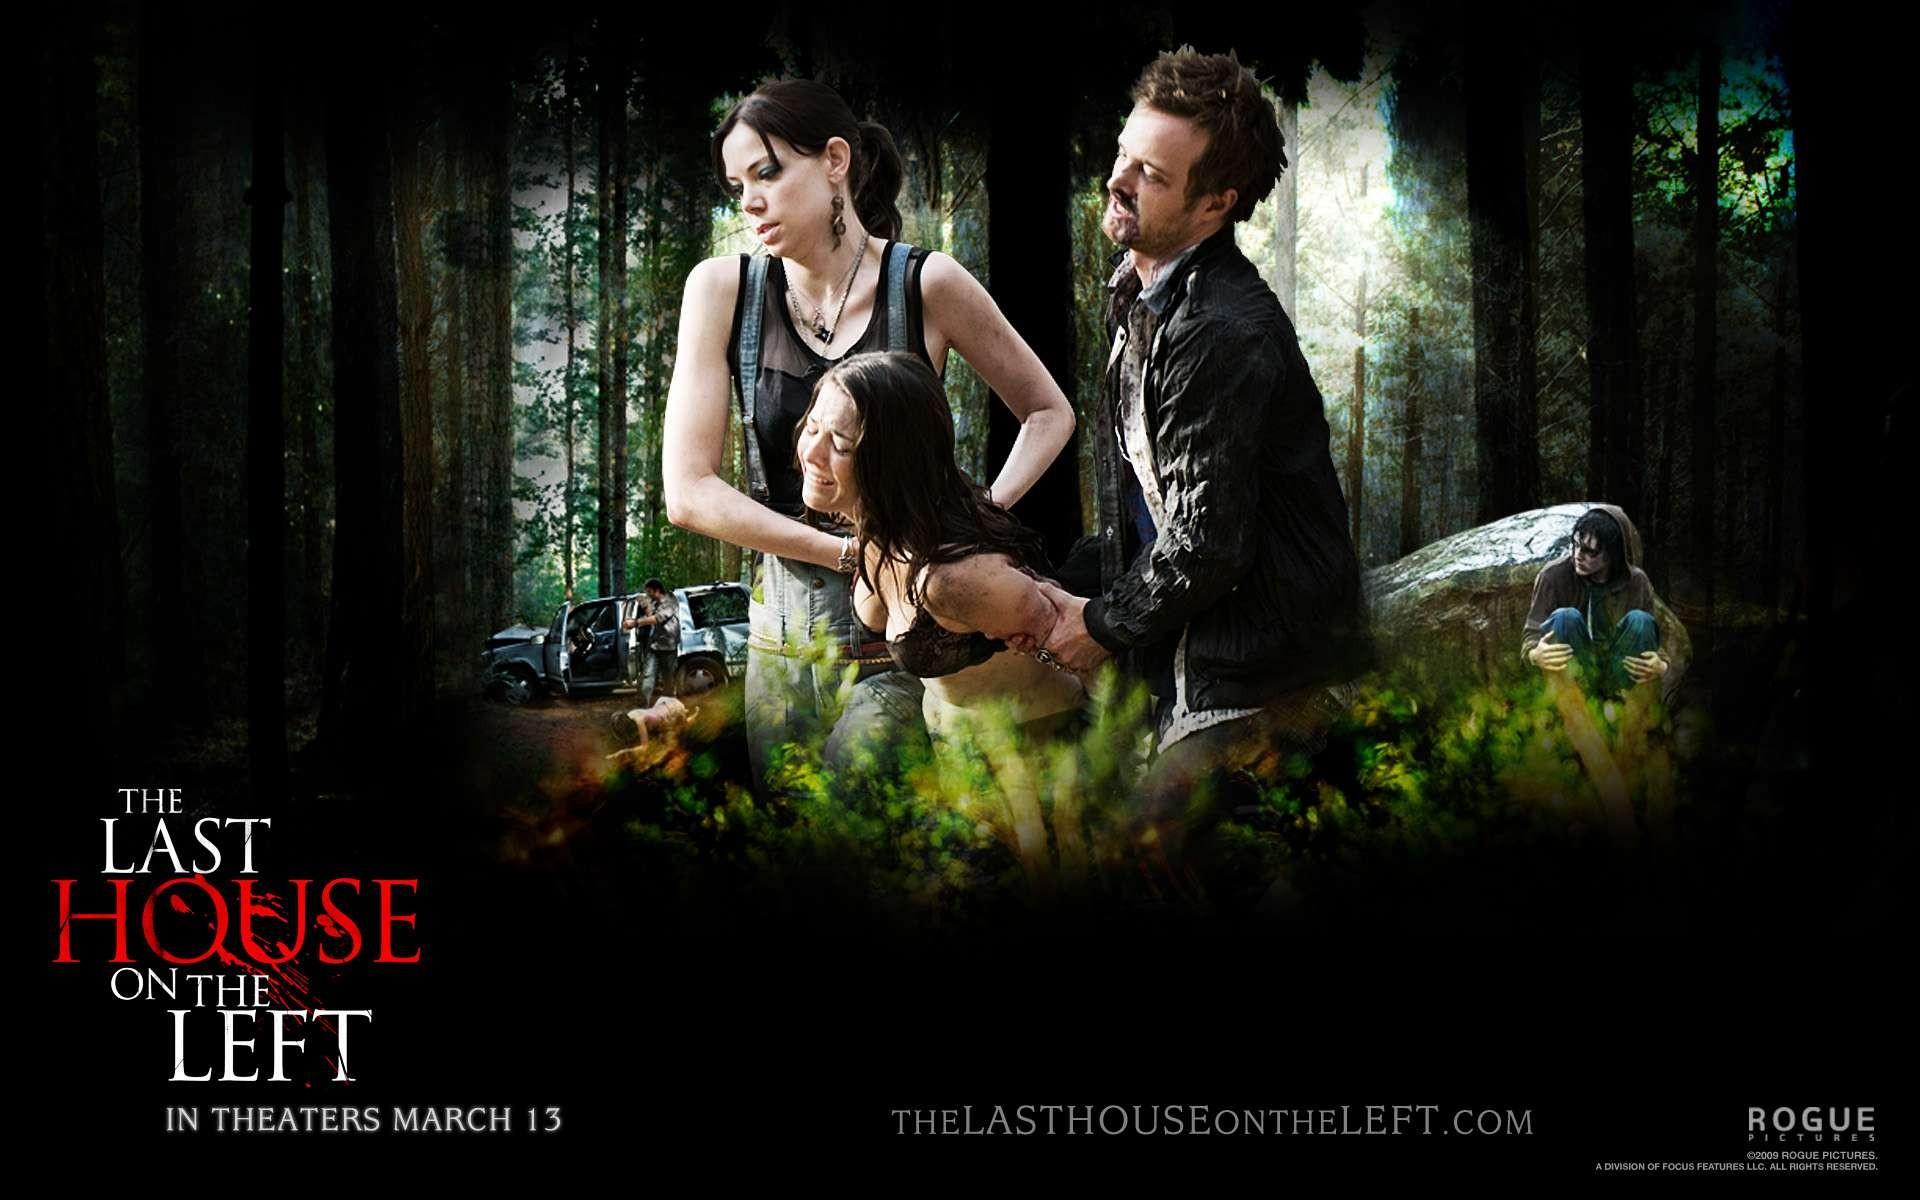 Wallpaper del film The Last House on the Left